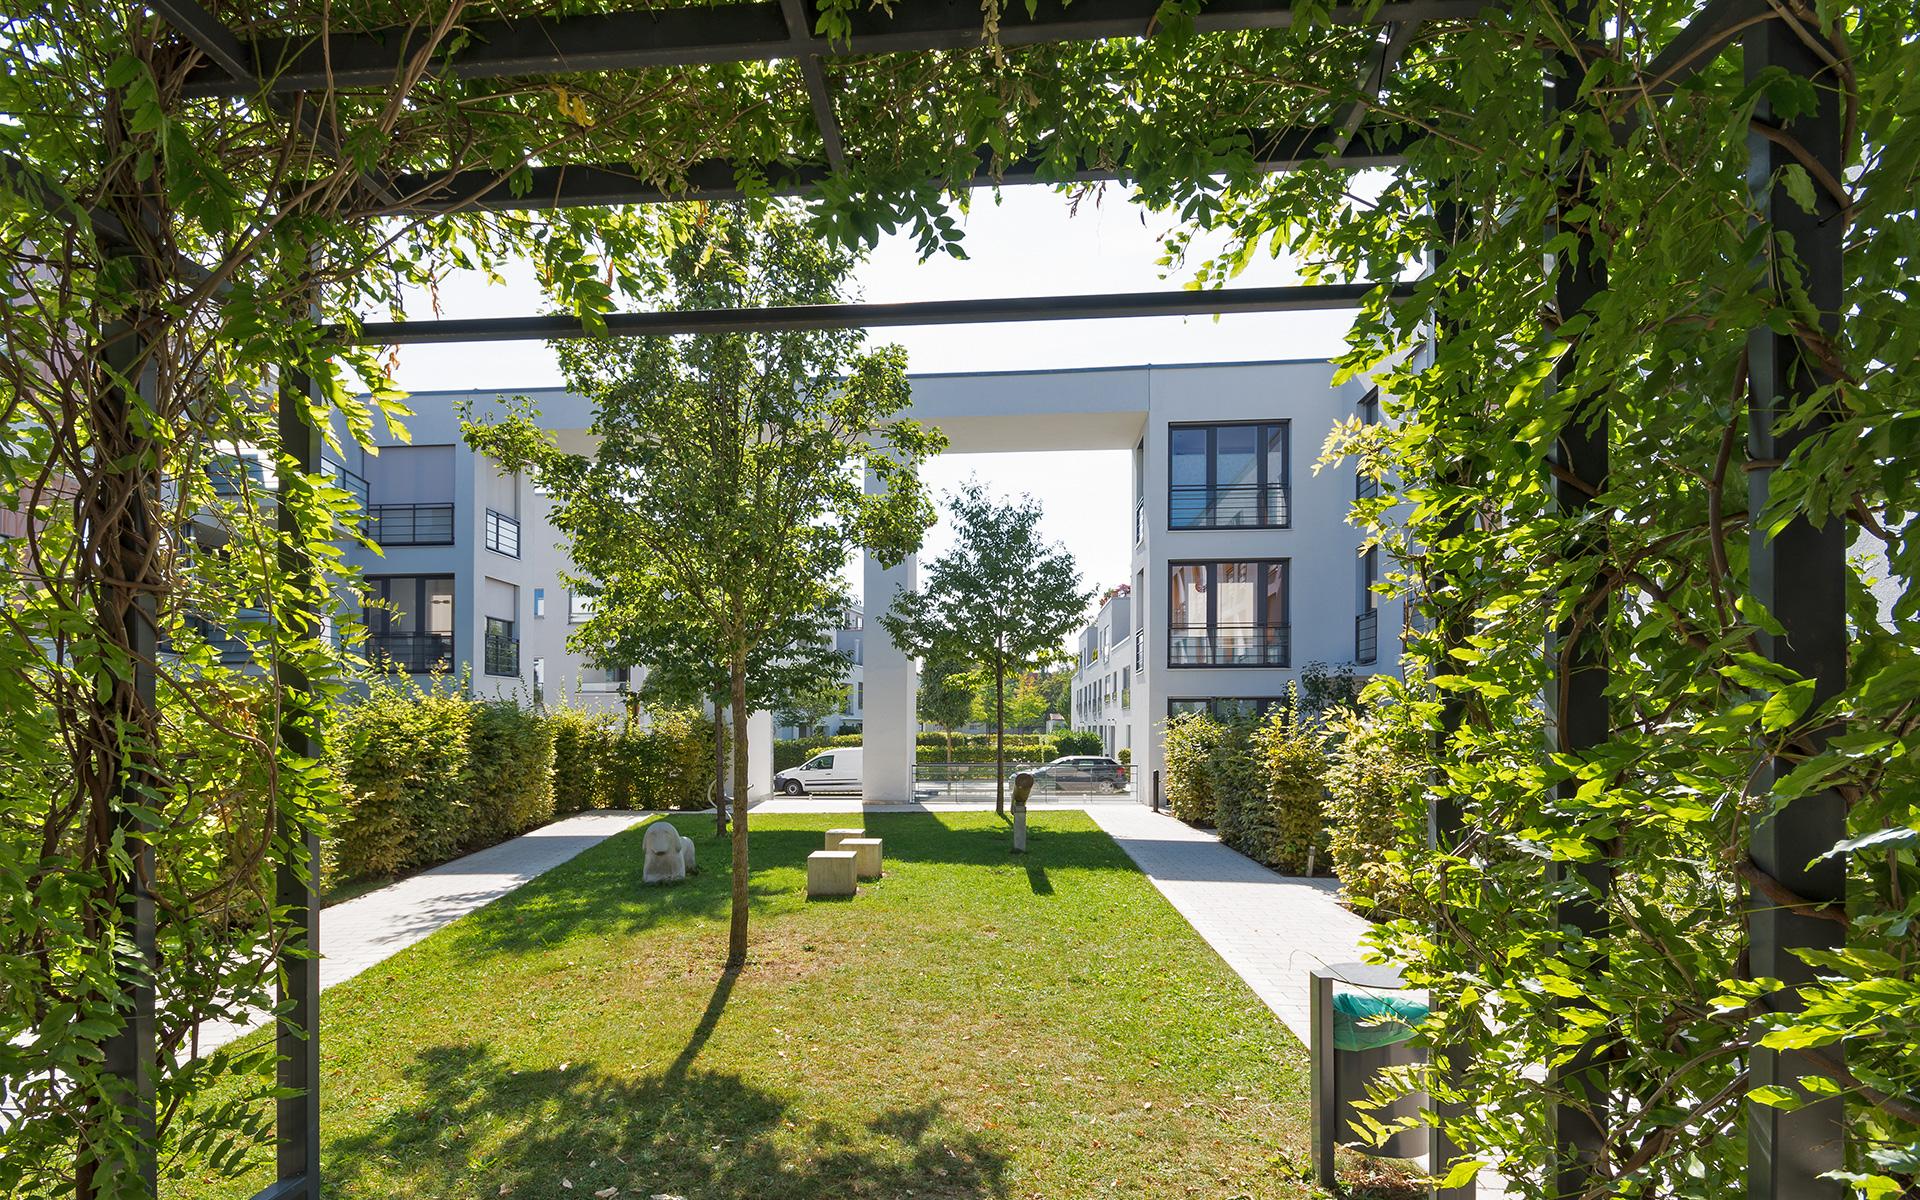 Pandion Prime Wohnanlage In München Schwabing Pöttinger Immobilien